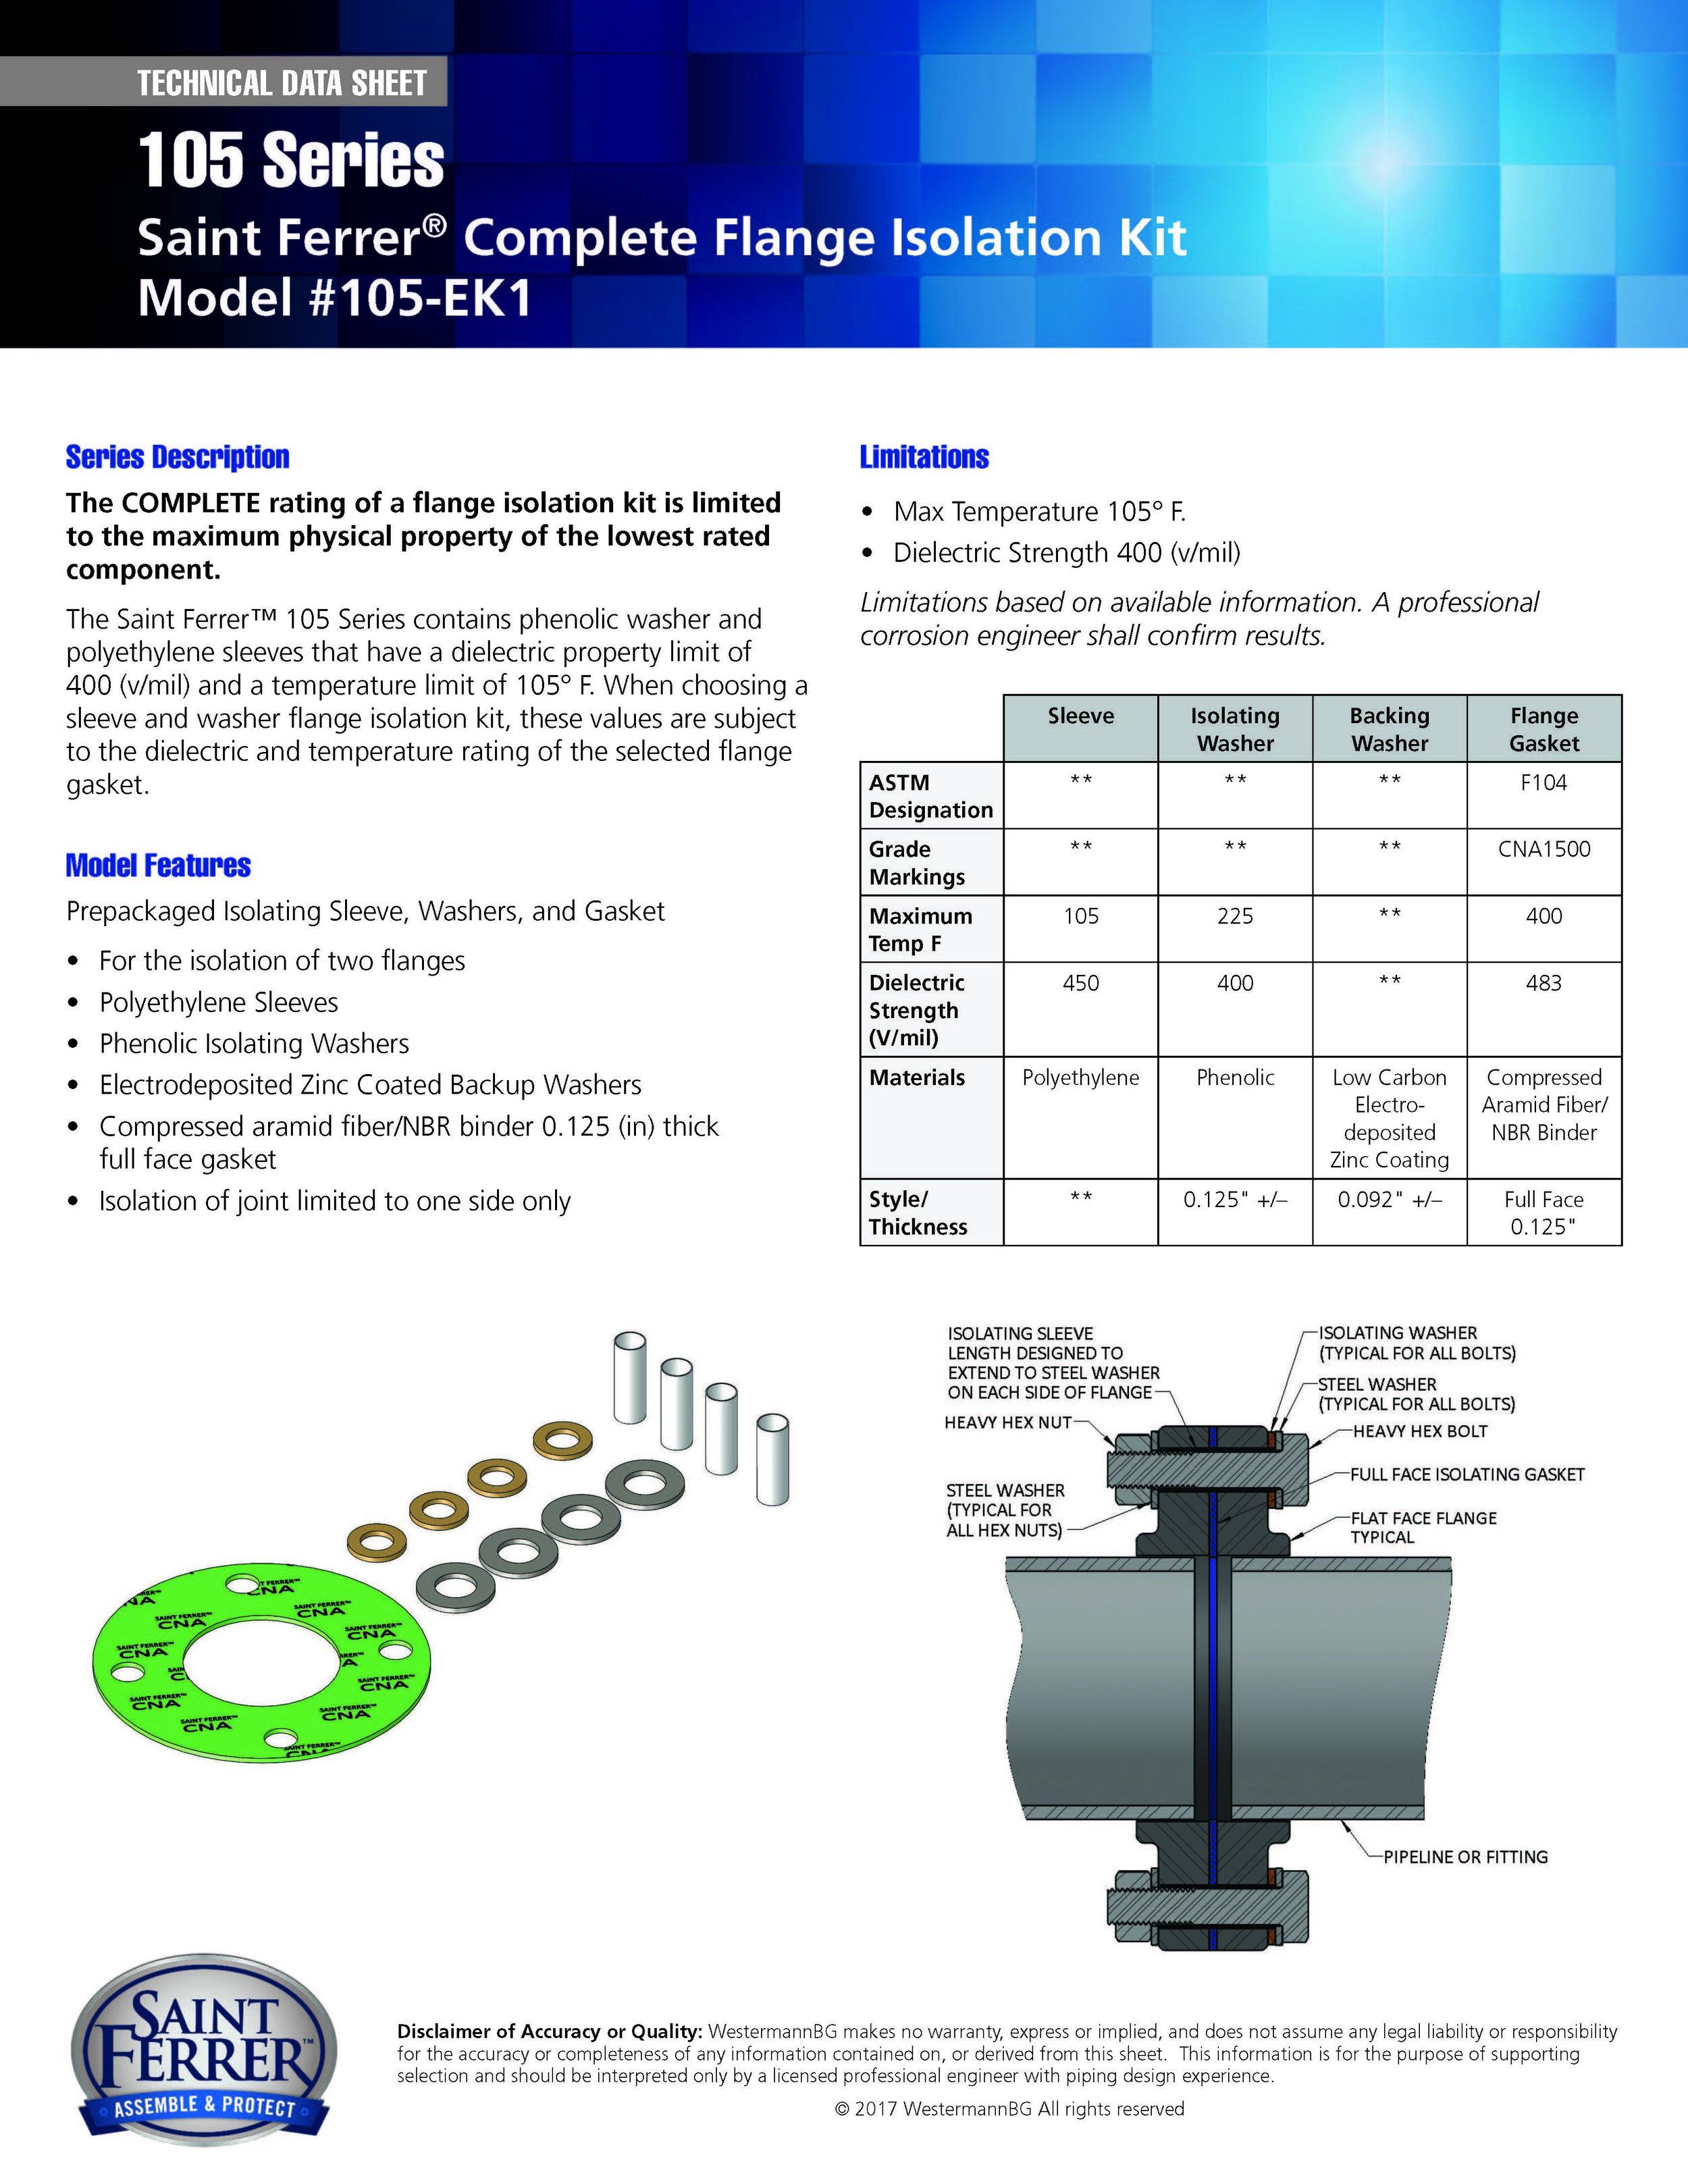 SF_Data_Sheet_105_Series_105-EK1.jpg